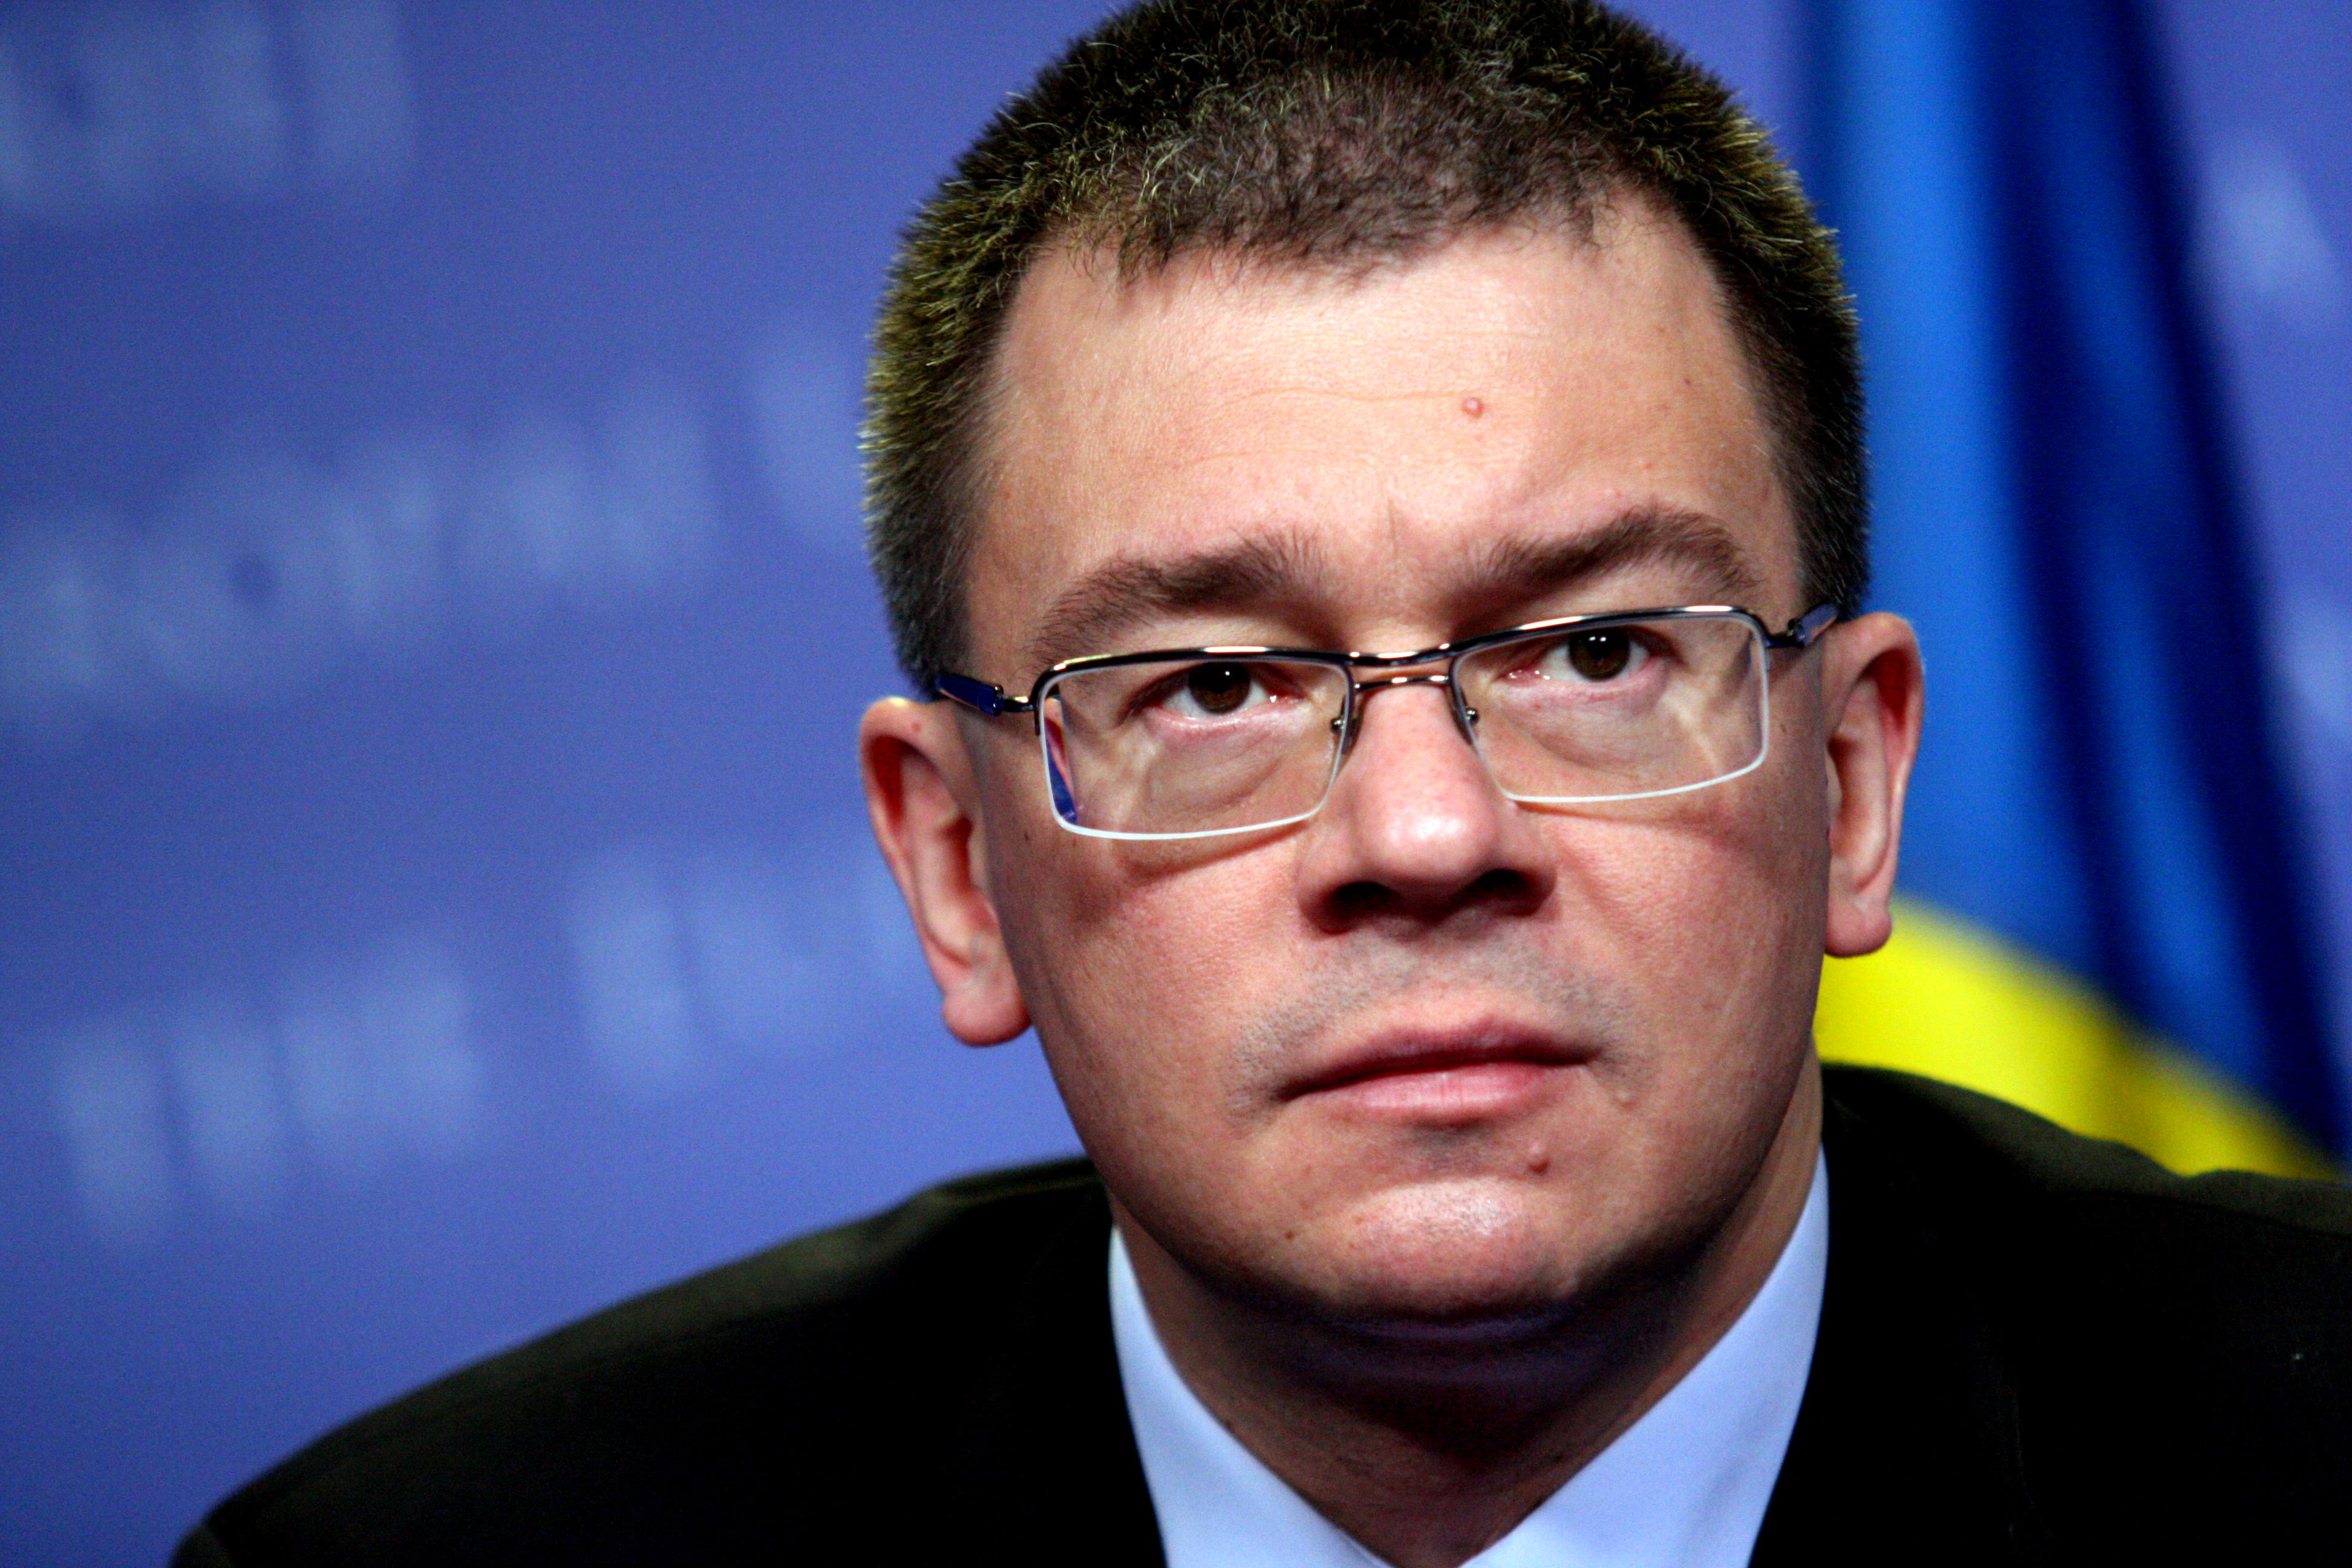 Premierul Ungureanu ar fi TRANTIT USA dupa o sedinta a coalitiei. Udrea: